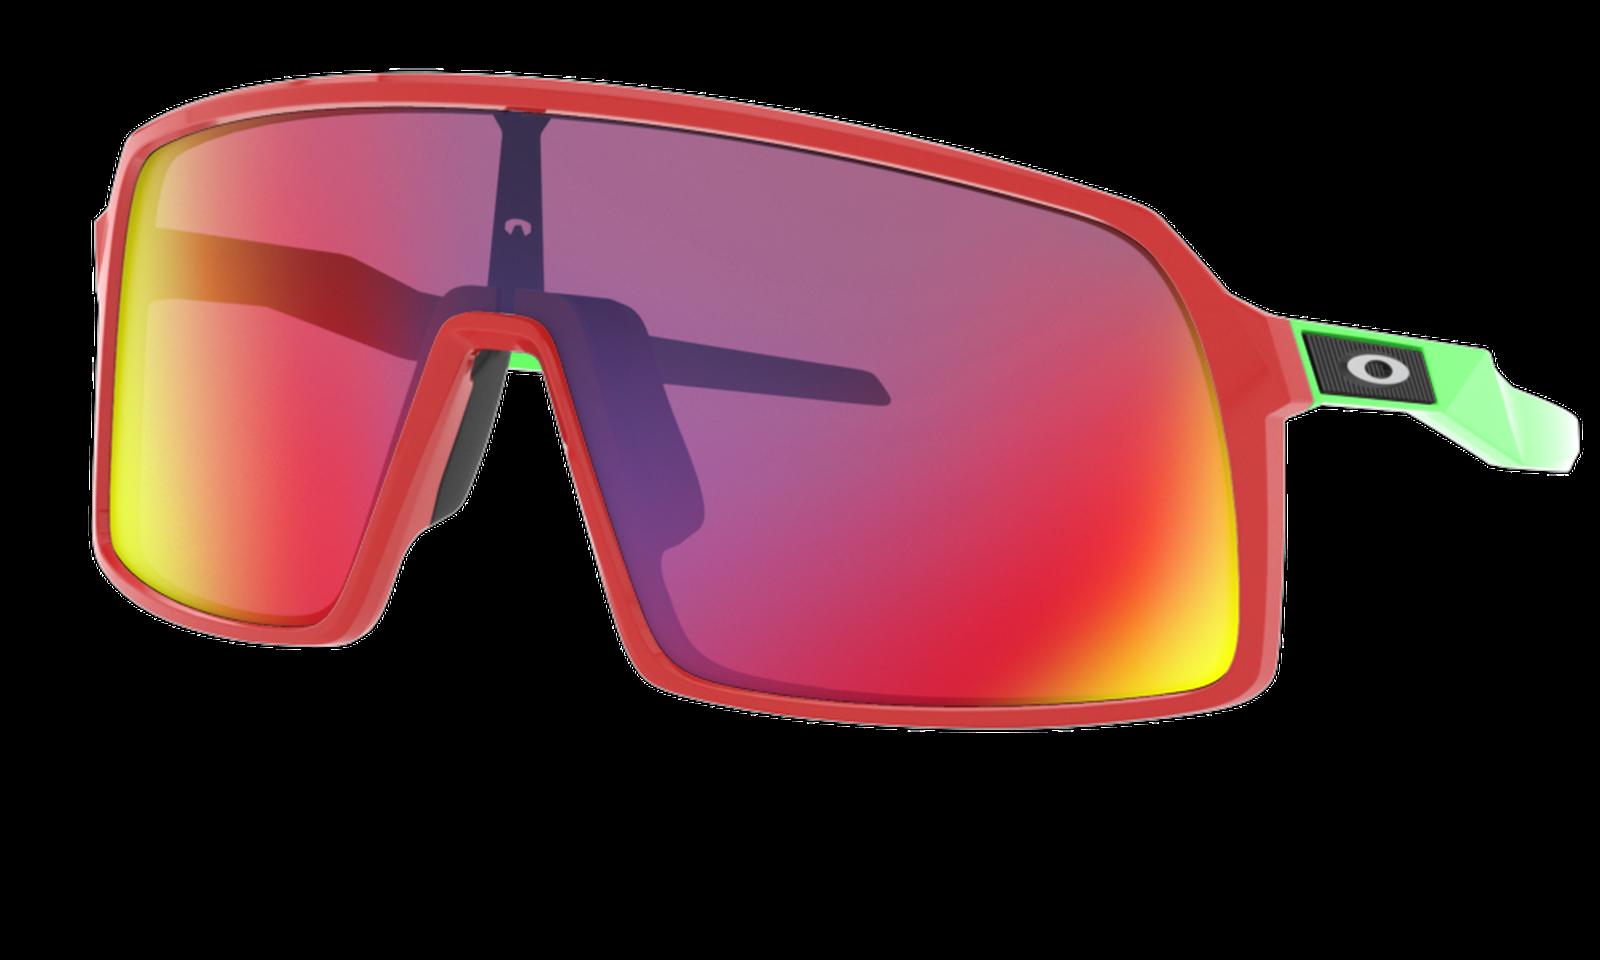 static oakley sunglasses